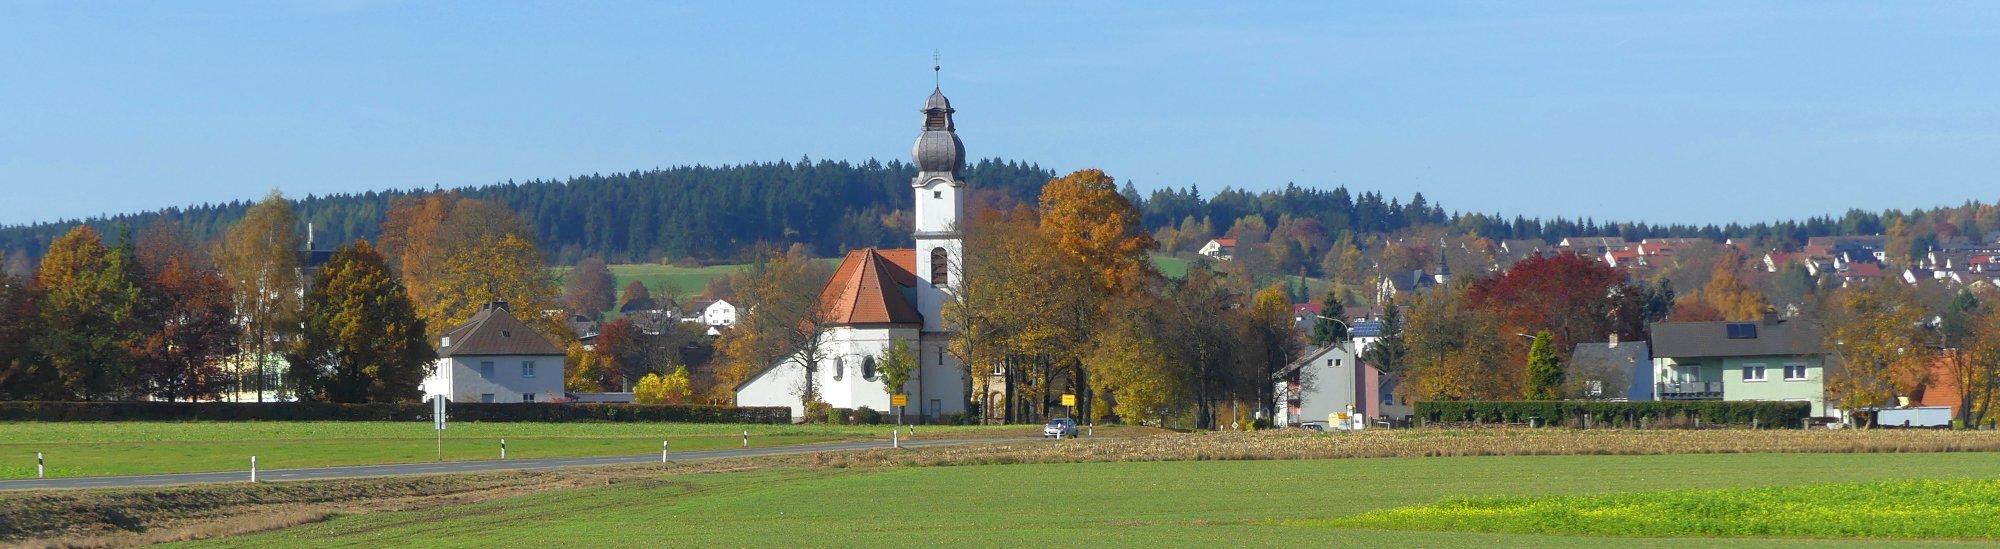 Asch Tschechien schönwald